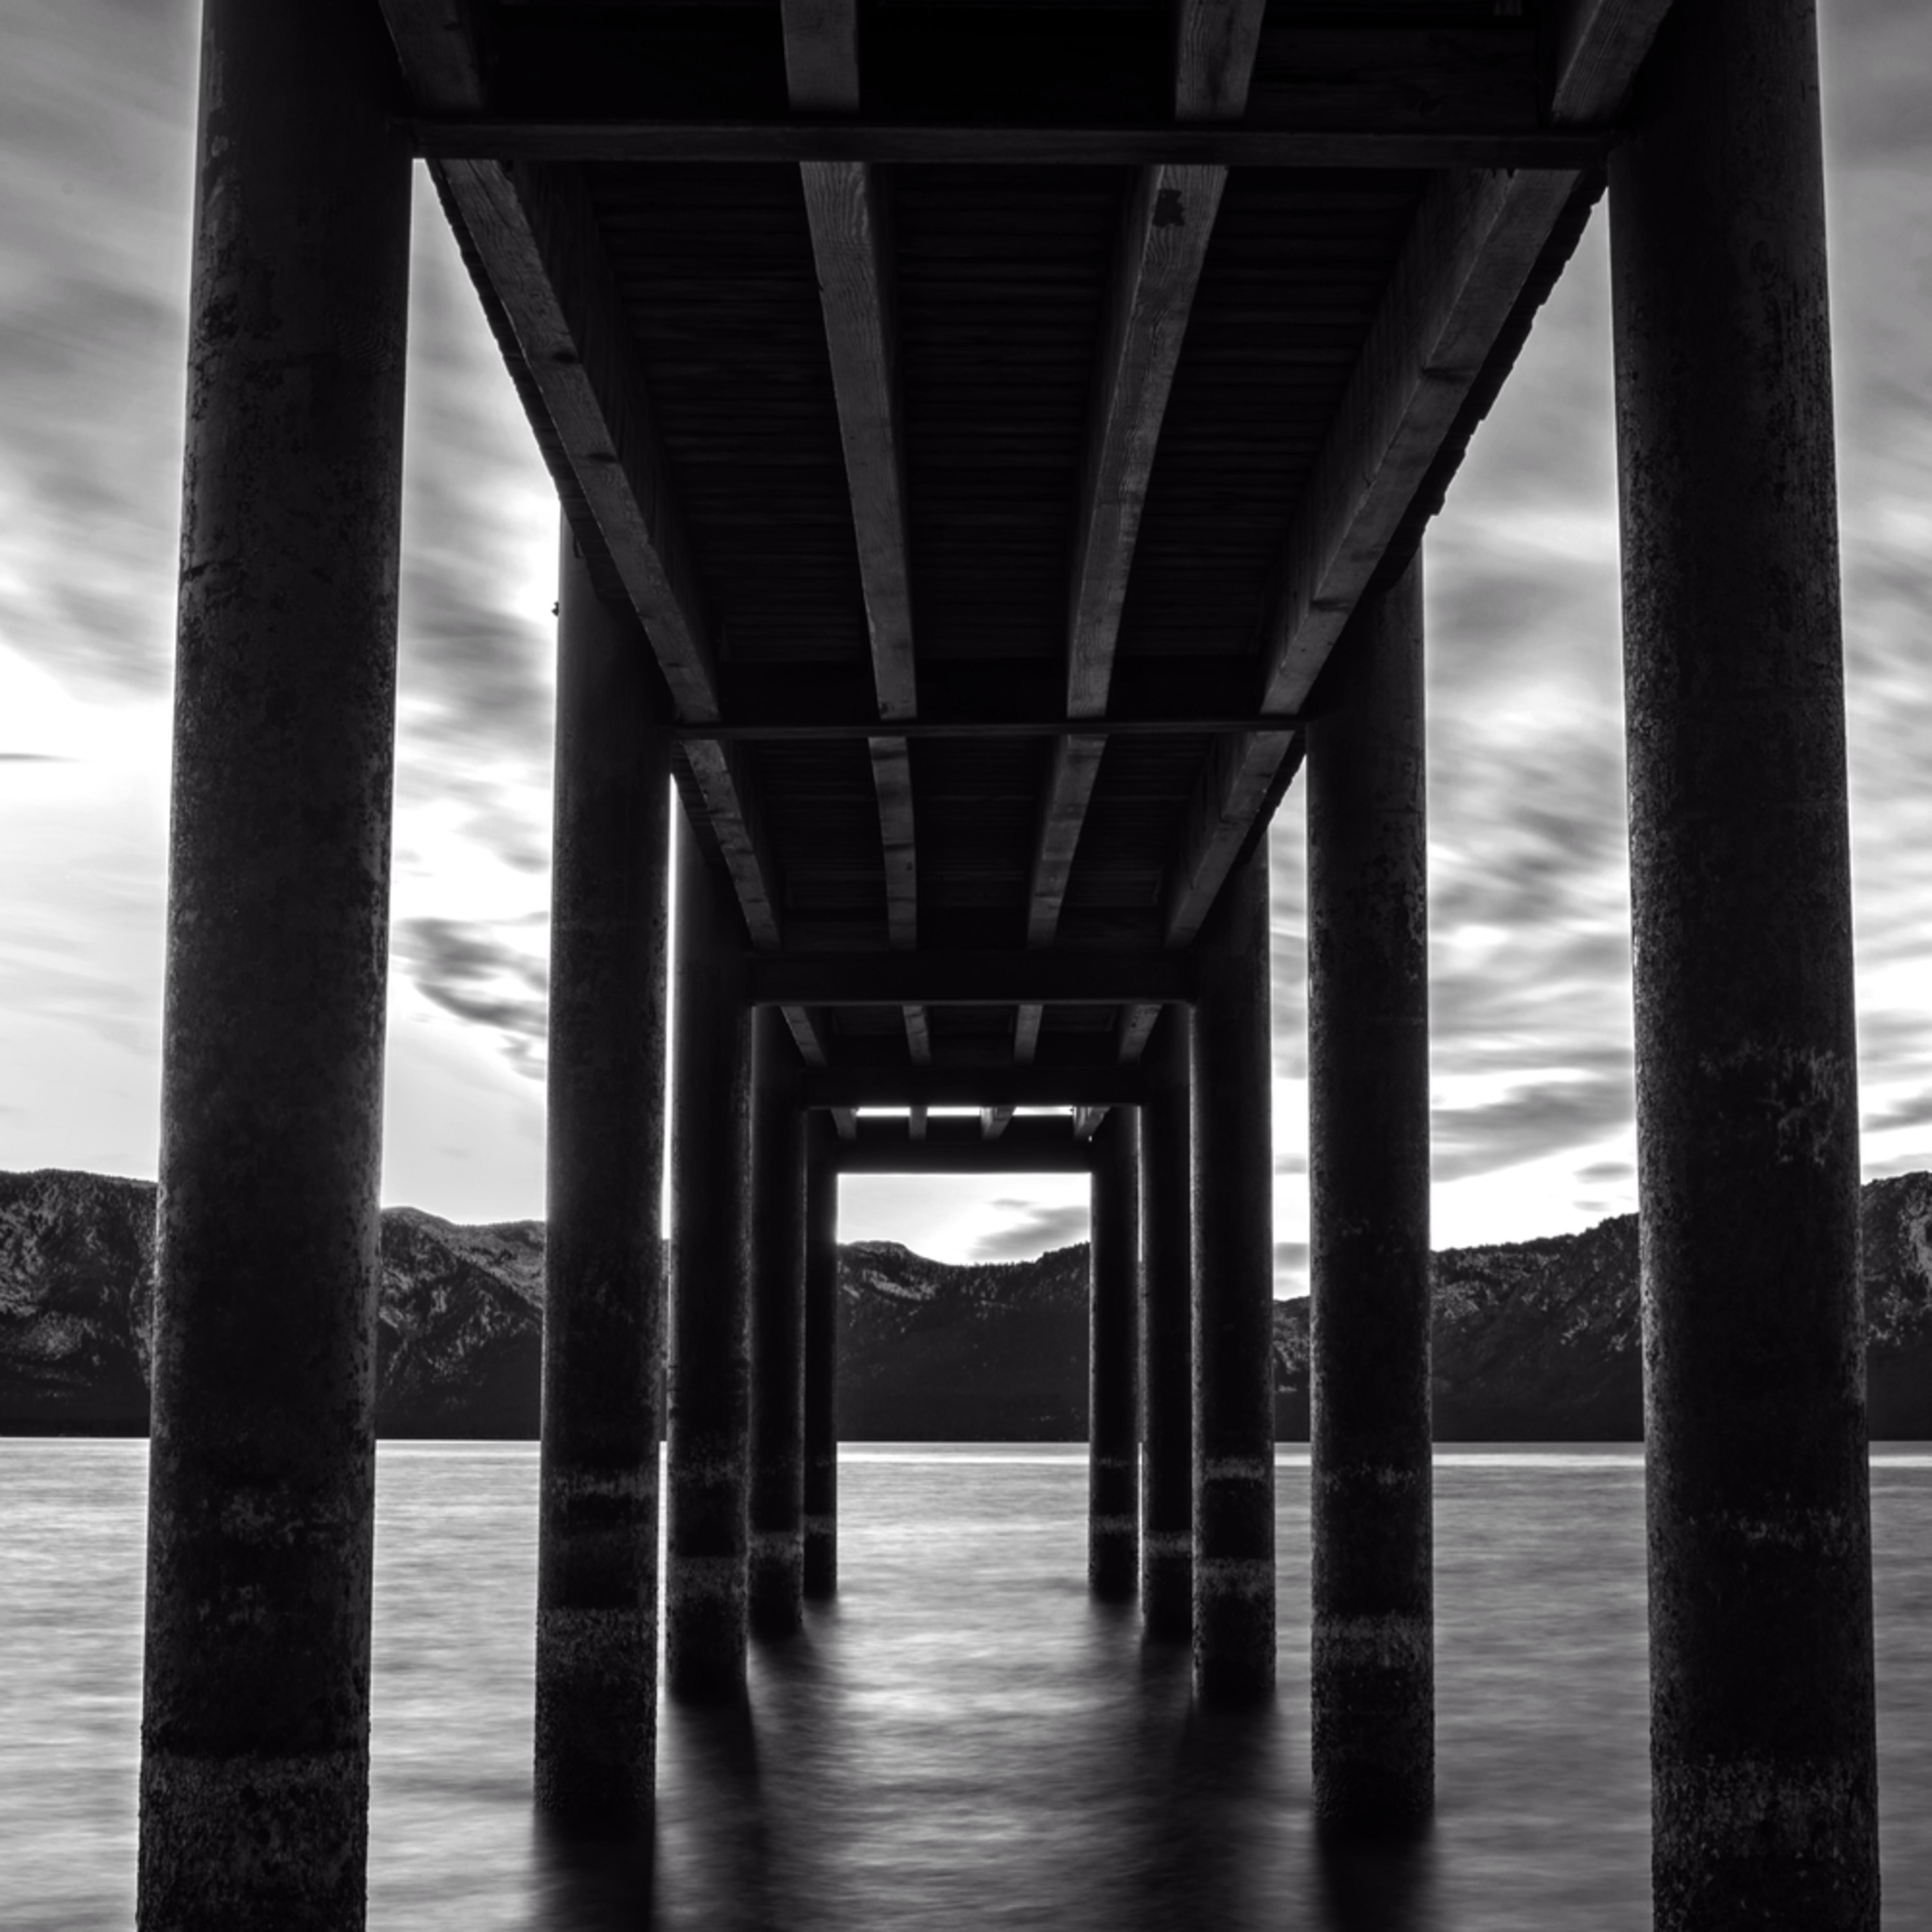 Under the bridge b w mklsc3